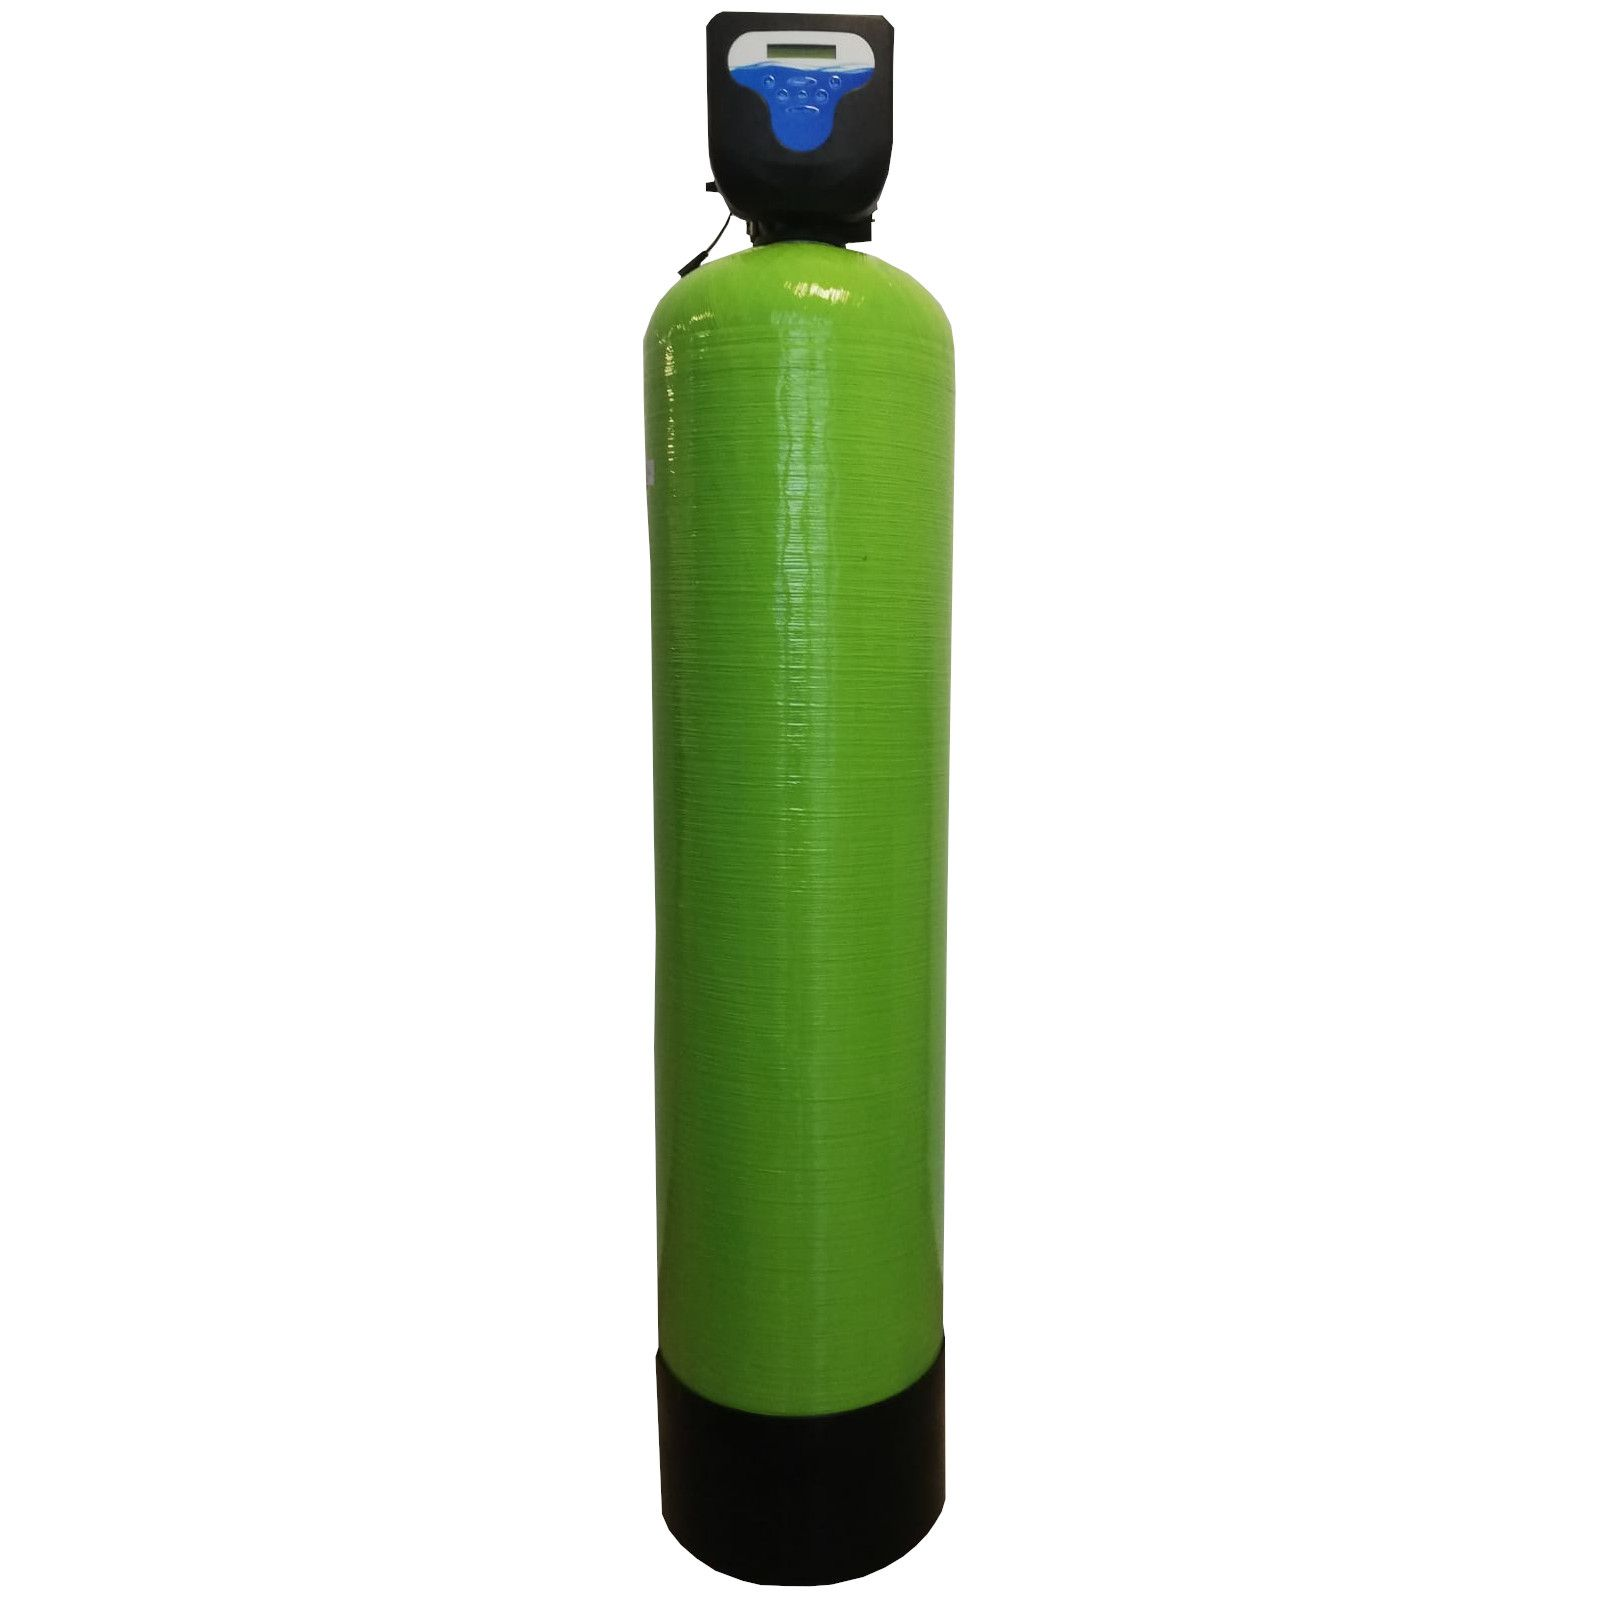 Filtru apa automat cu zeolit Aqua DM 80, Debit 4.7 mc/h, Capacitate filtrare 120.000 litri, Cartus din Rasina  - AquaFilters.ro